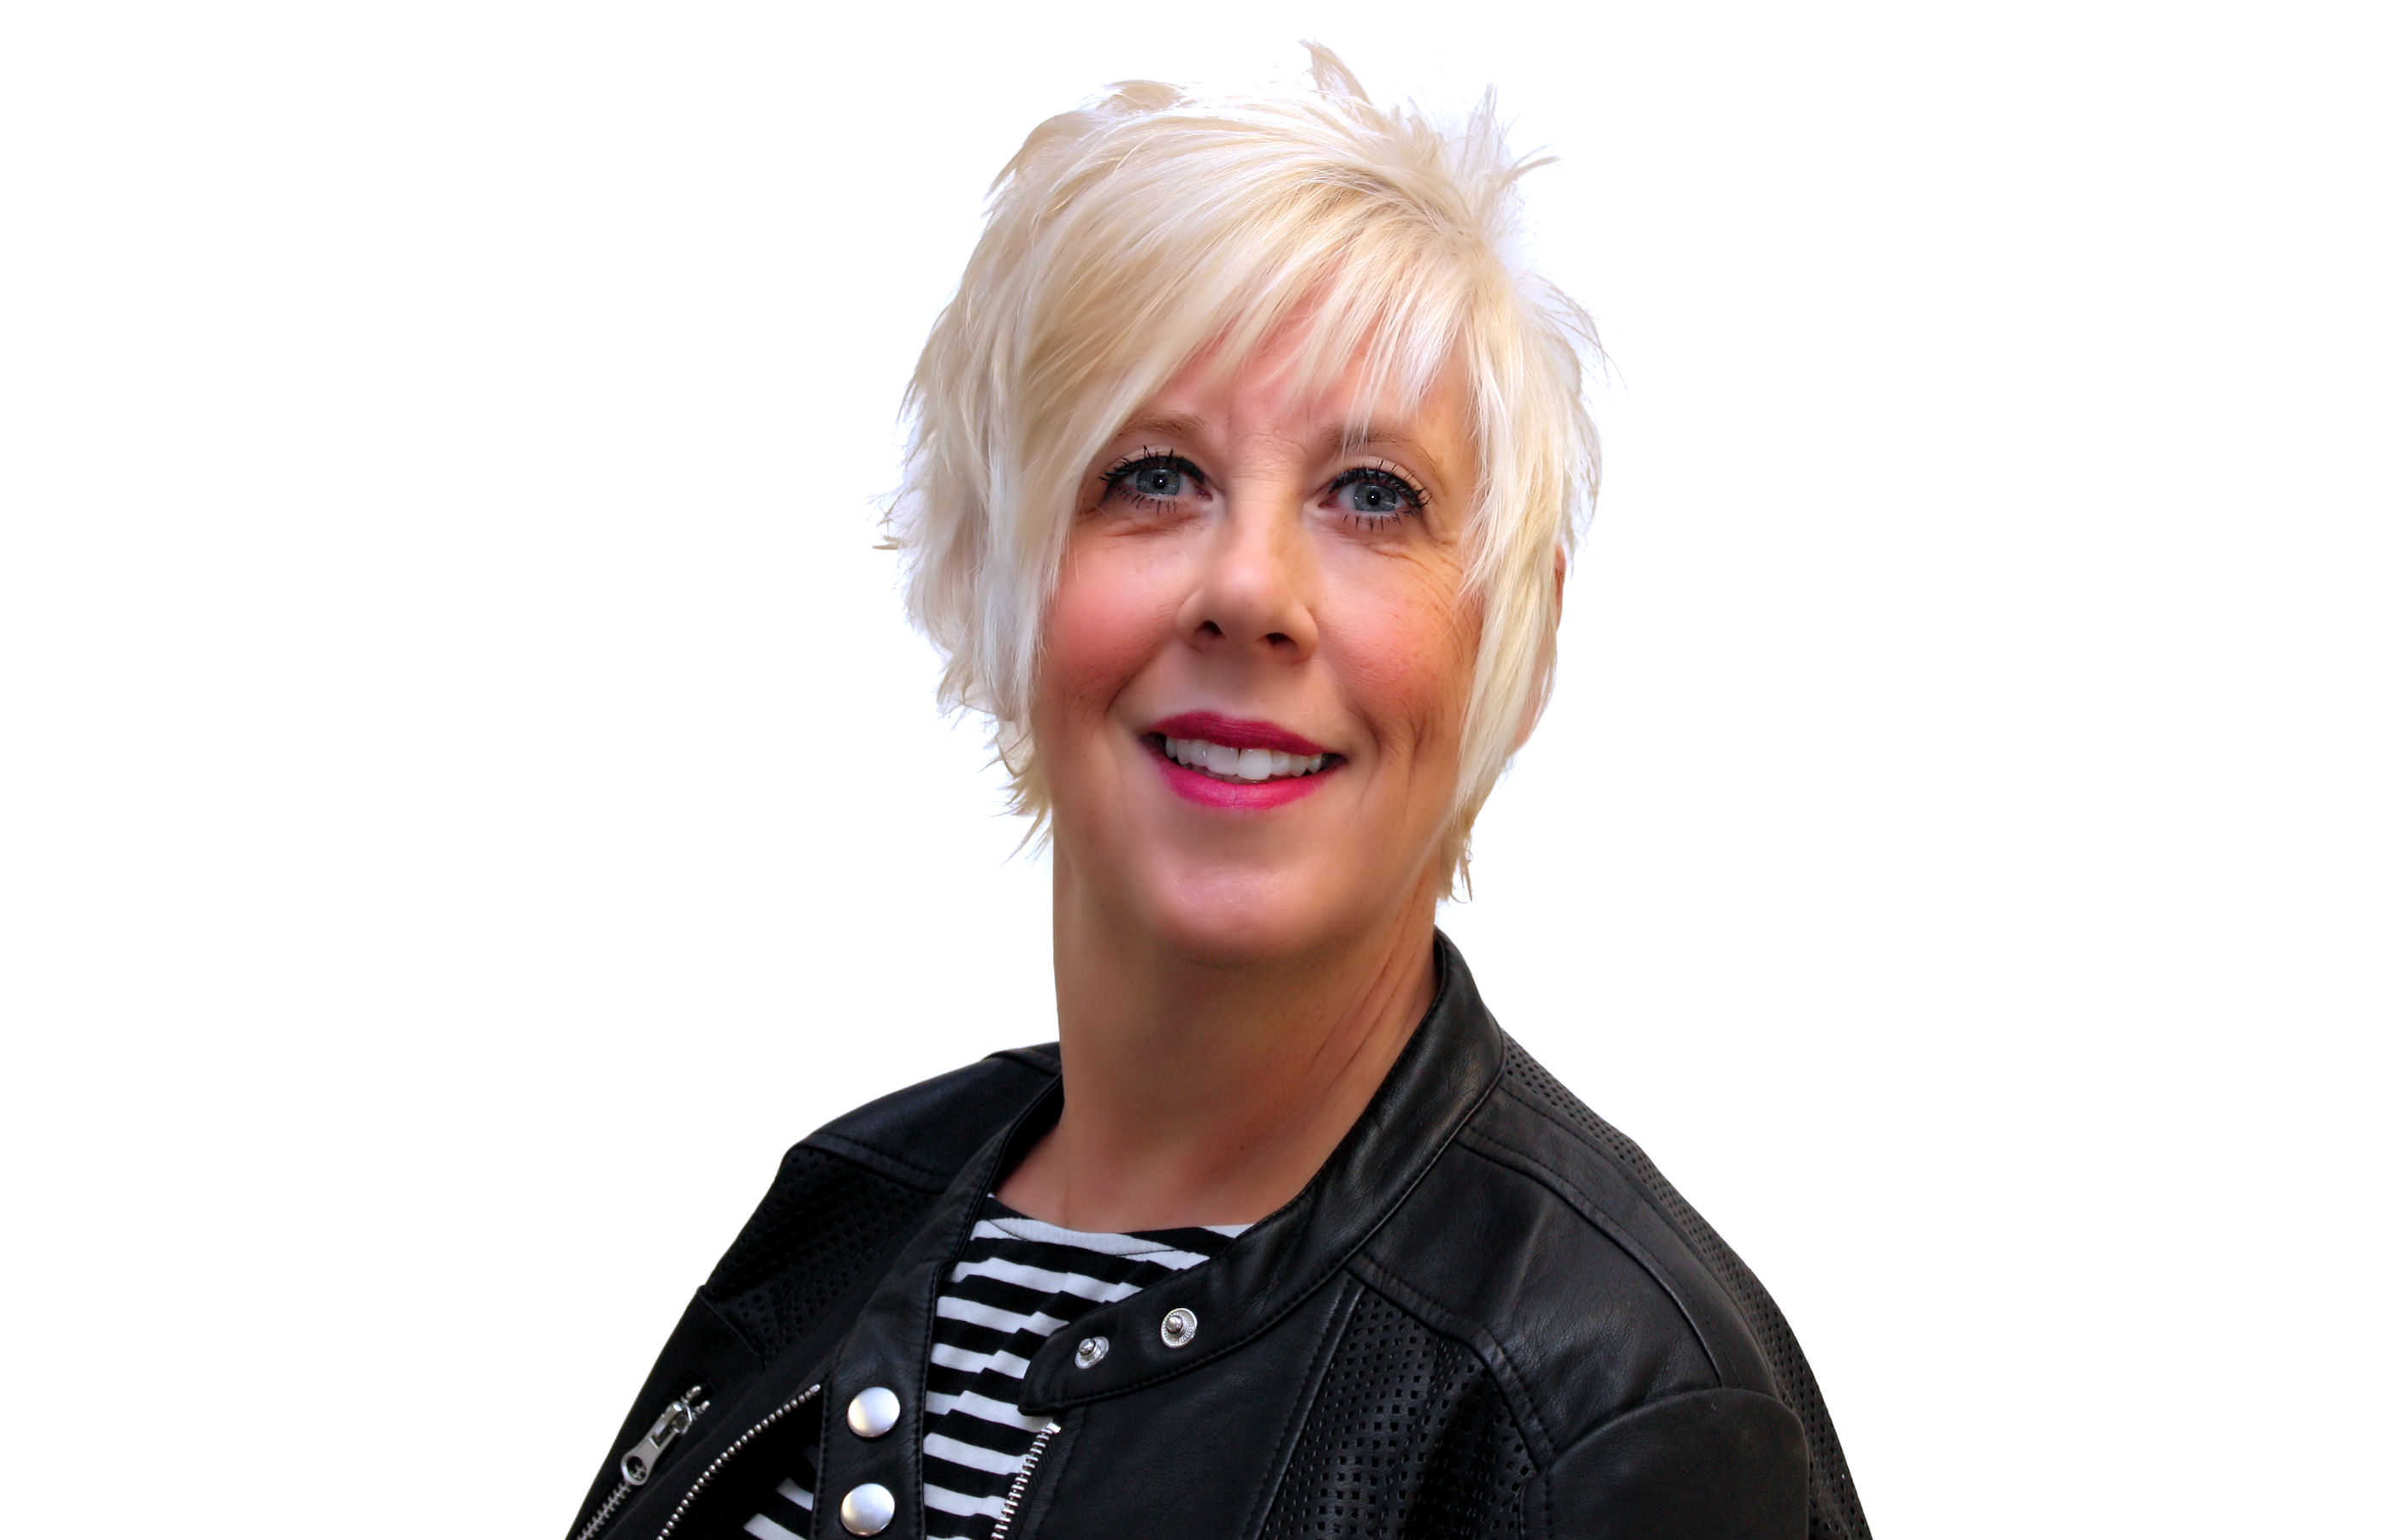 Linda McKinnell